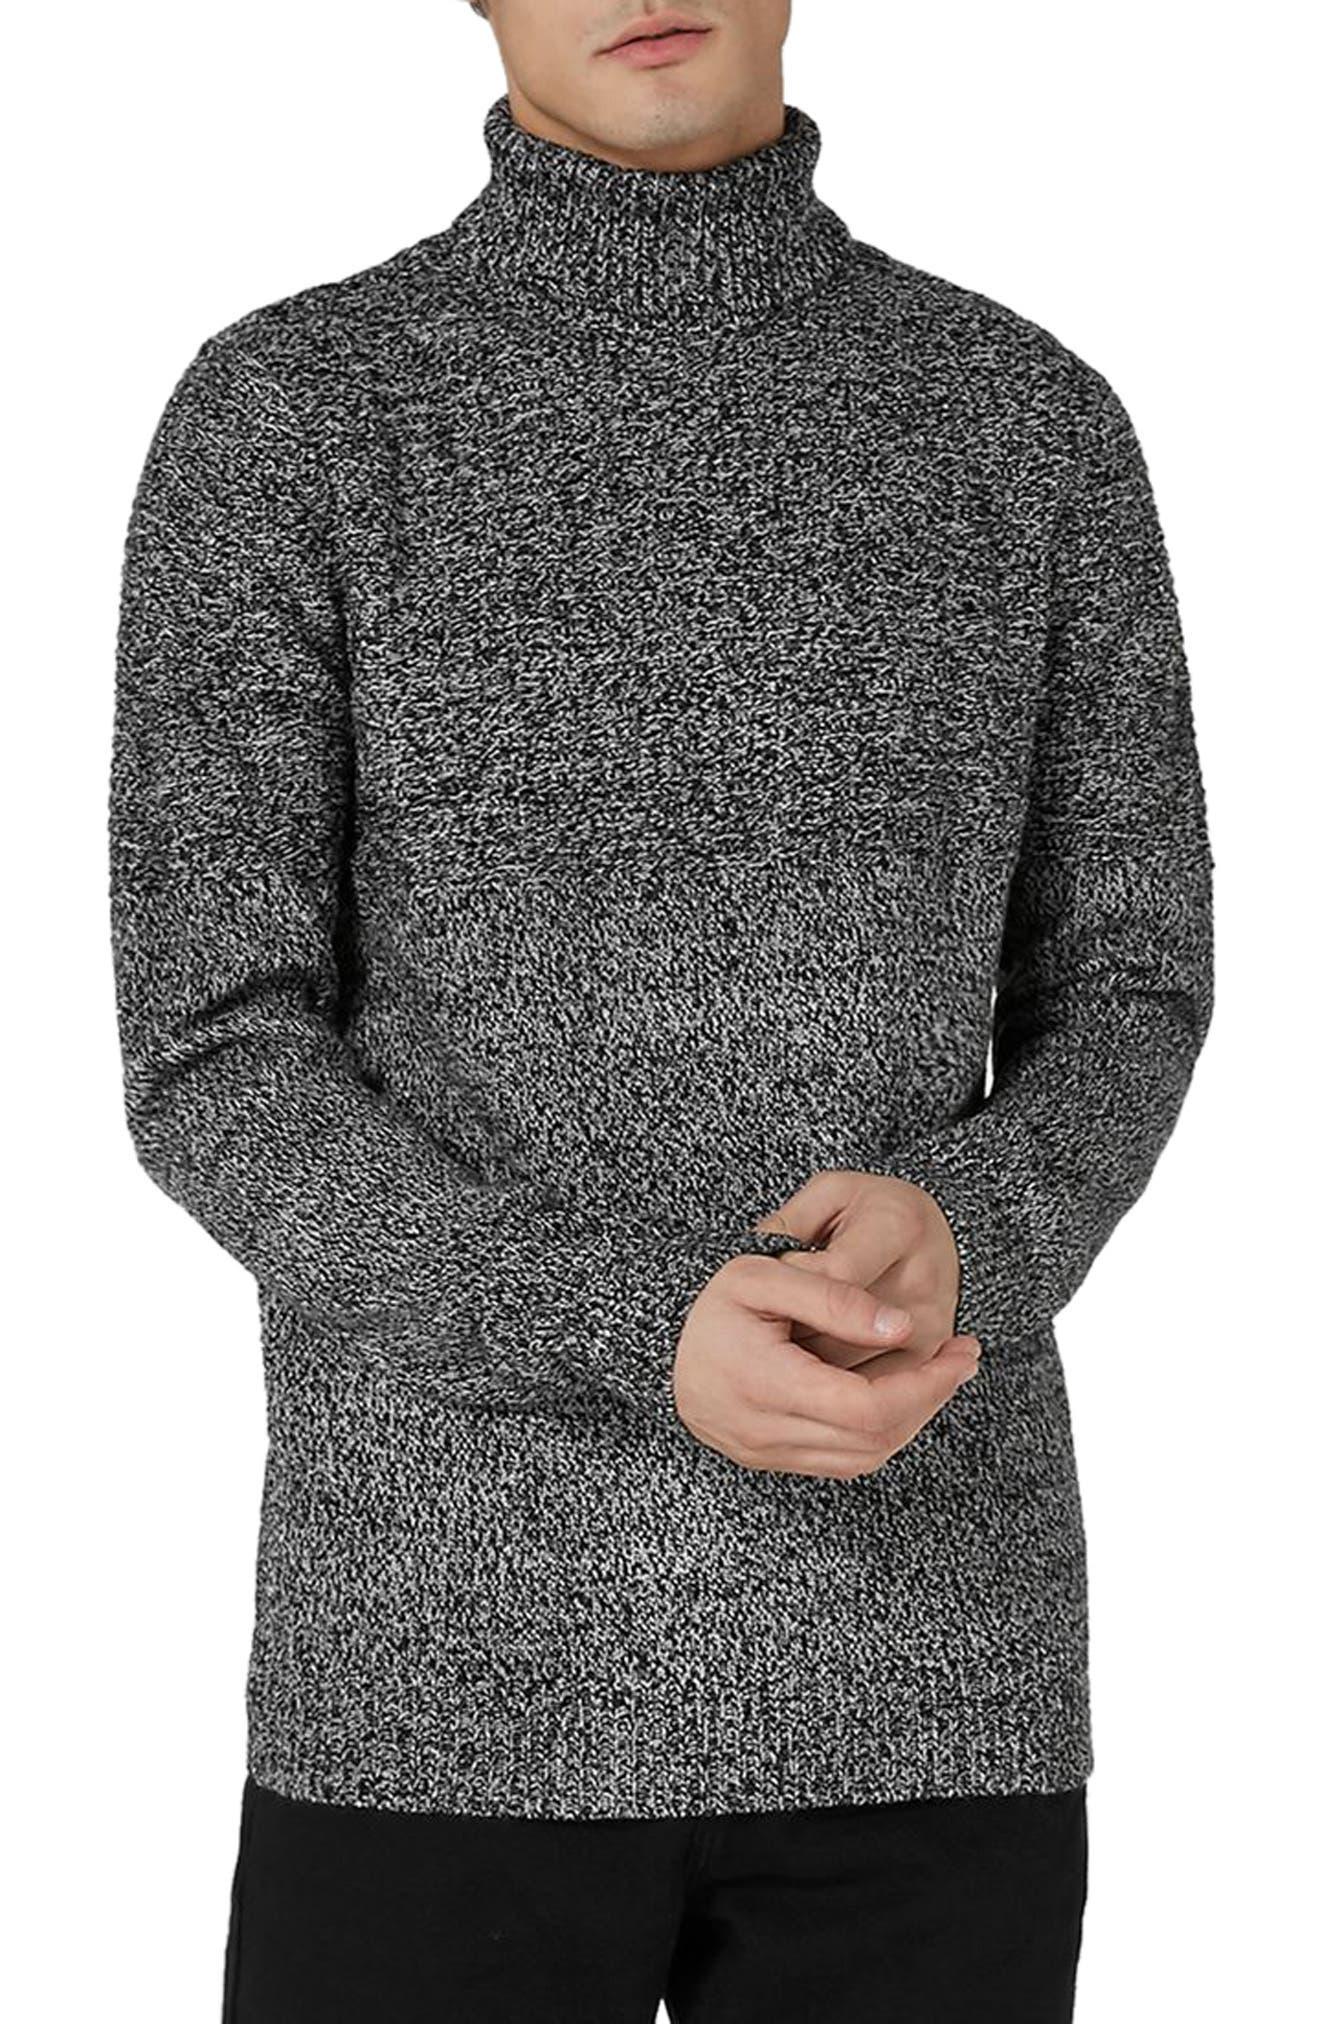 Twist Roll Neck Sweater,                         Main,                         color, Grey Multi